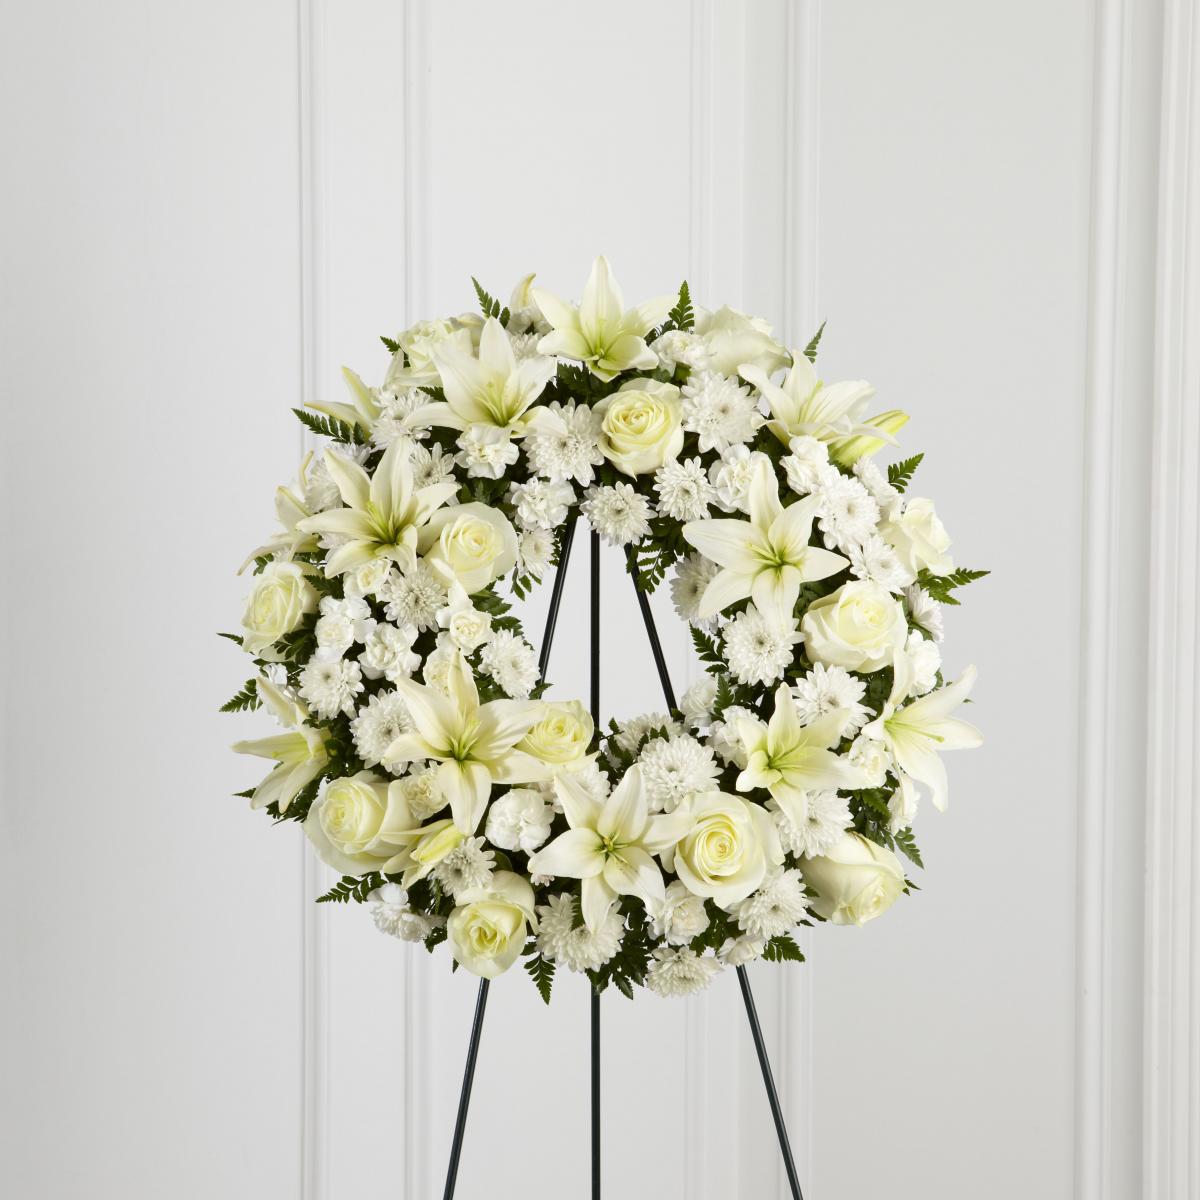 FTD® Treasured Tribute™ Wreath